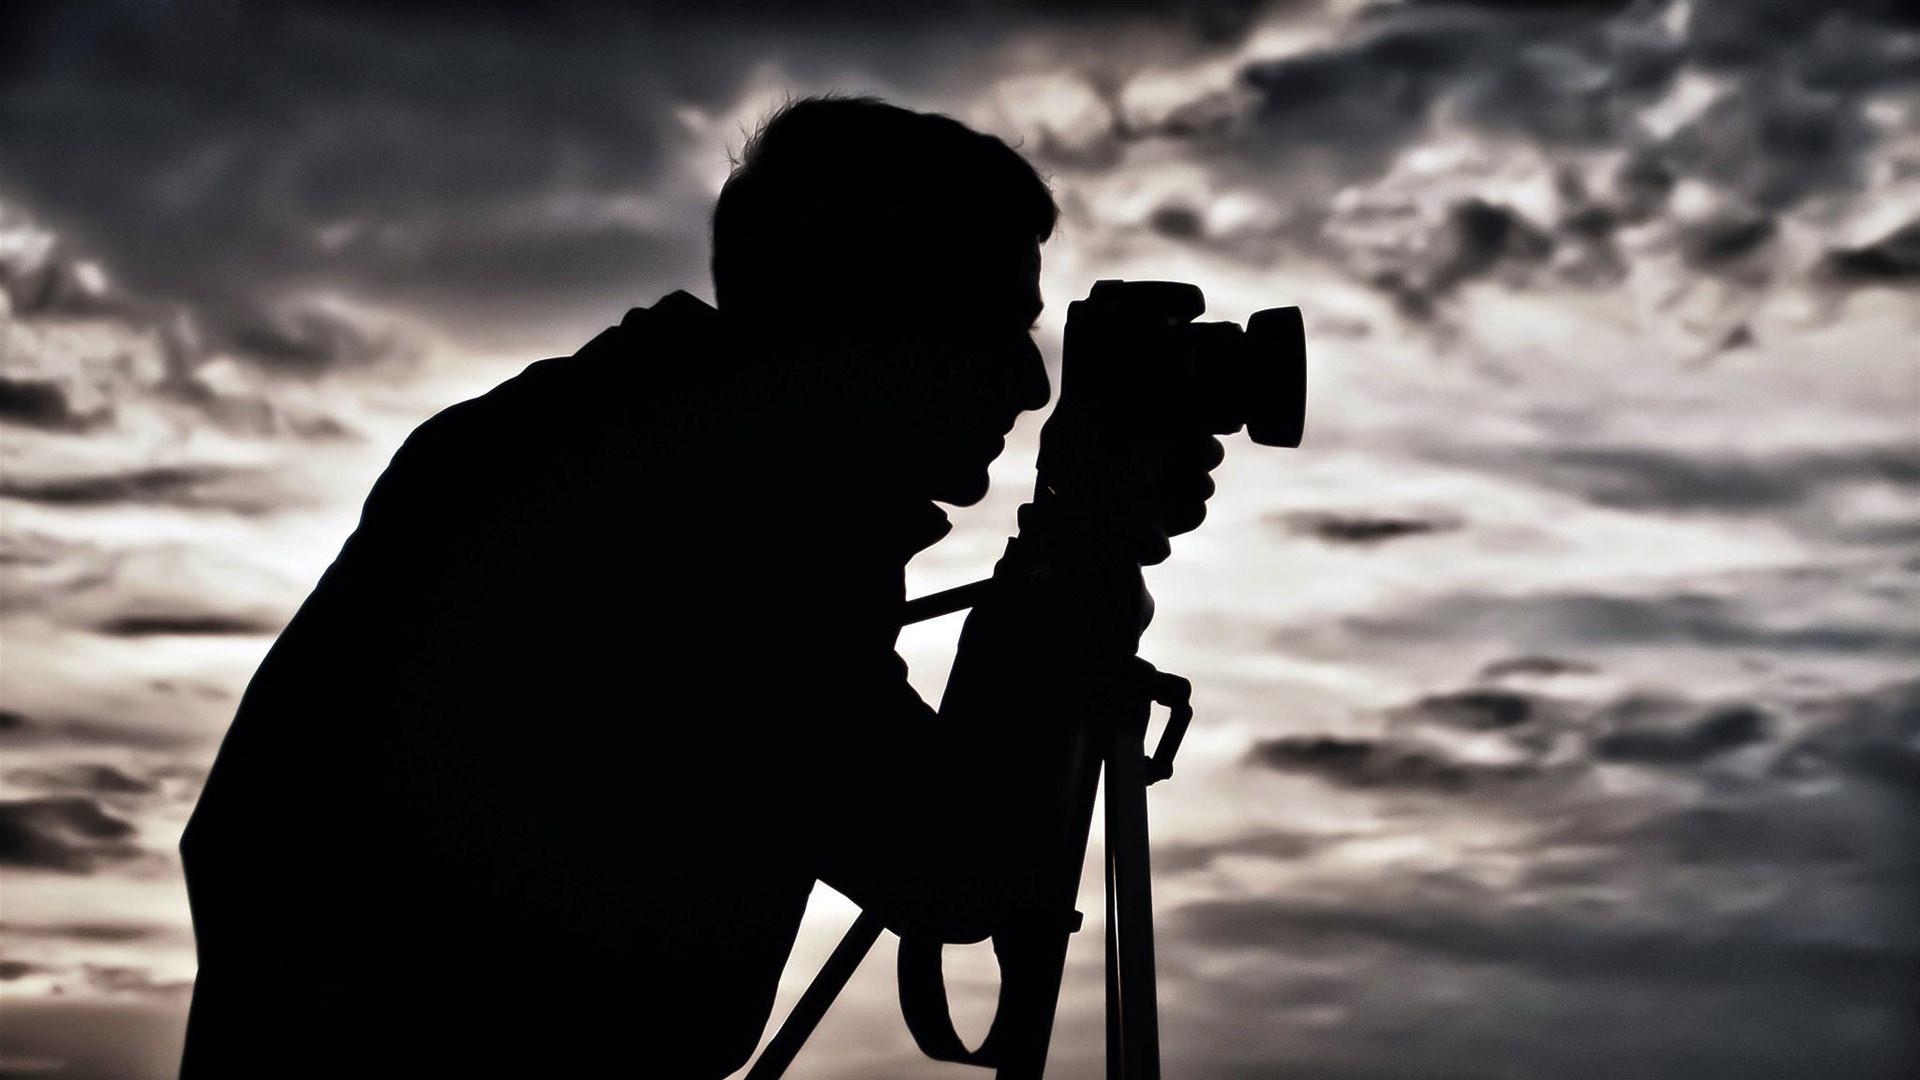 Photography HD Art And Photography Wallpapers   Wallpapers.Smajliji.com